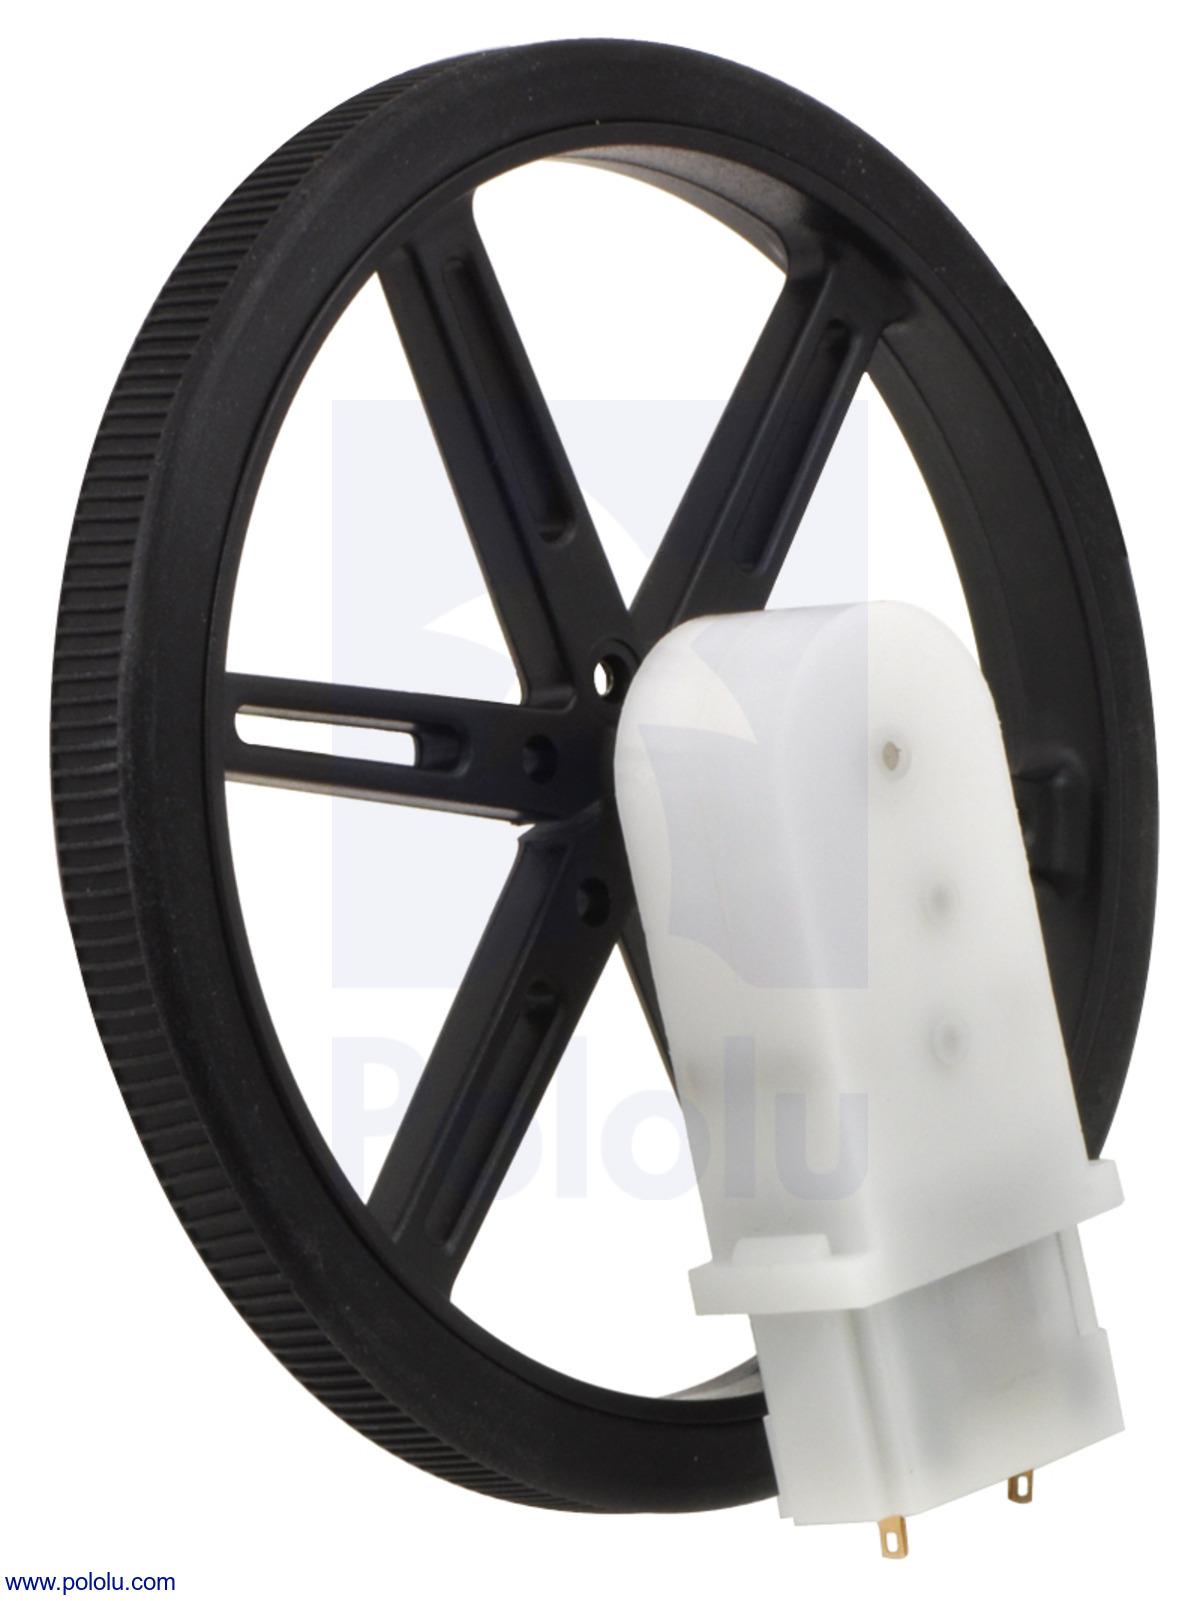 how to put a wheel on a d sharft